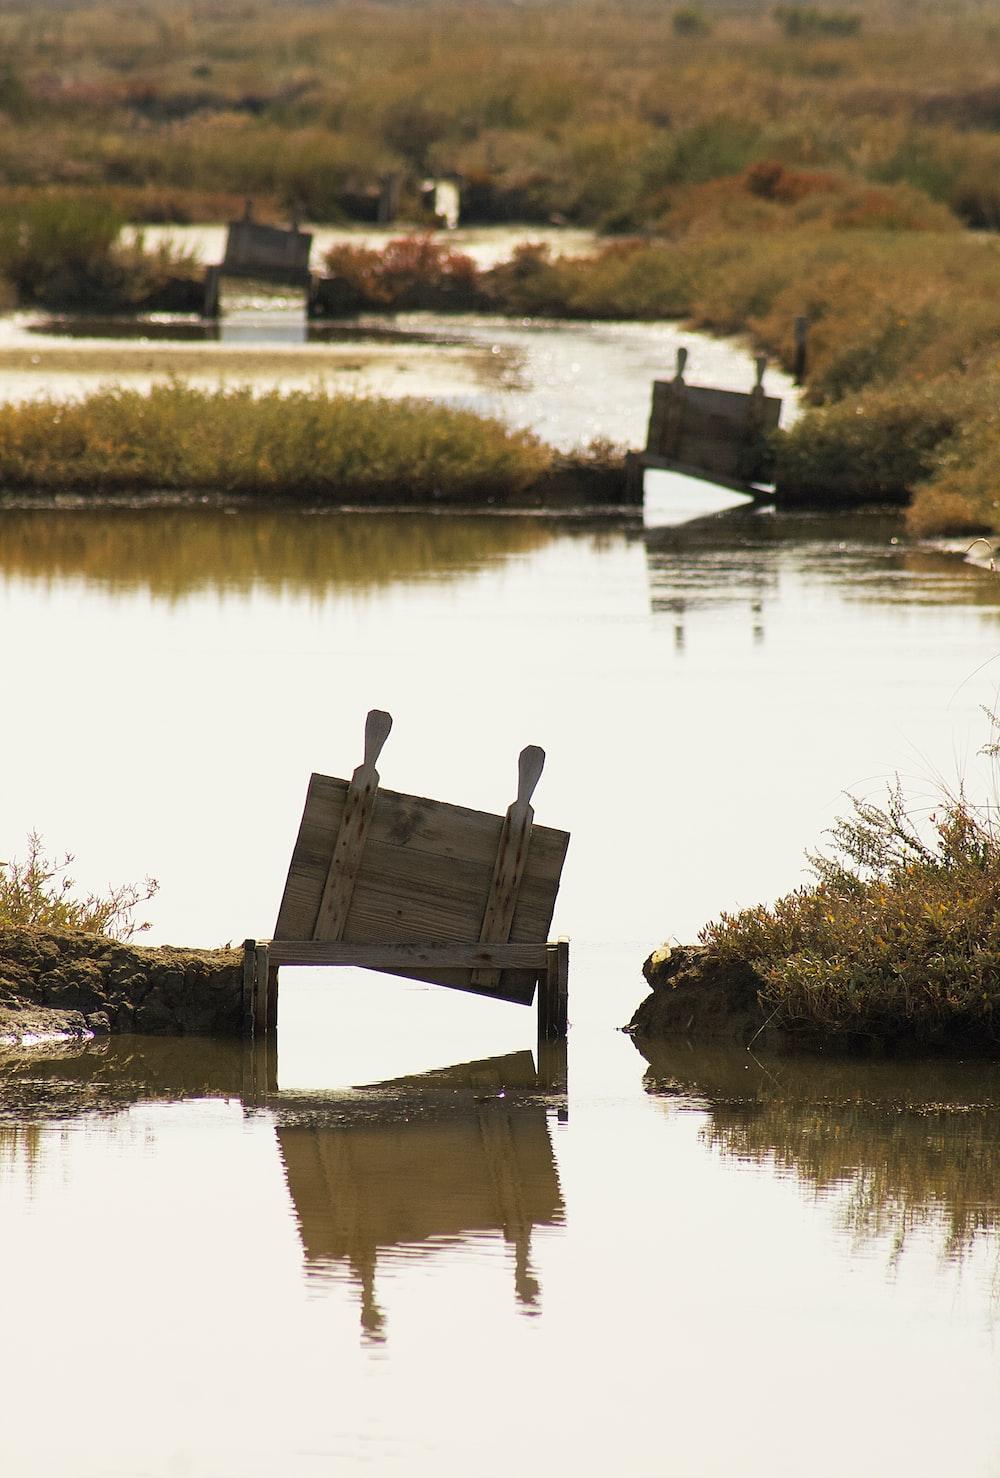 brown wooden bench on lake dock during daytime